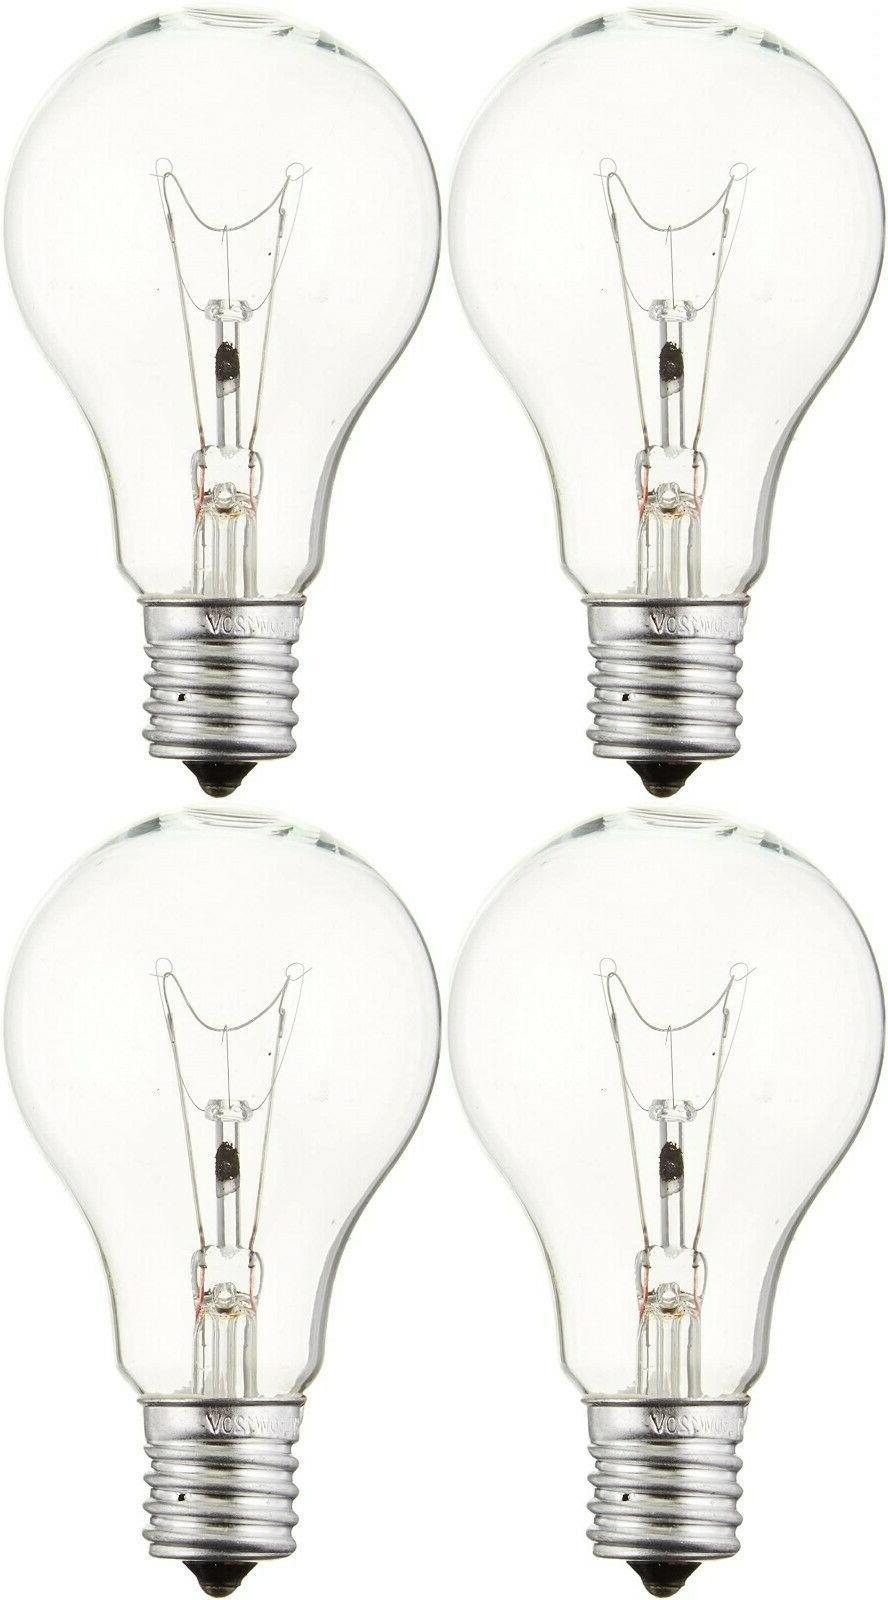 SYLVANIA 60 W A15 Fan Light Bulbs